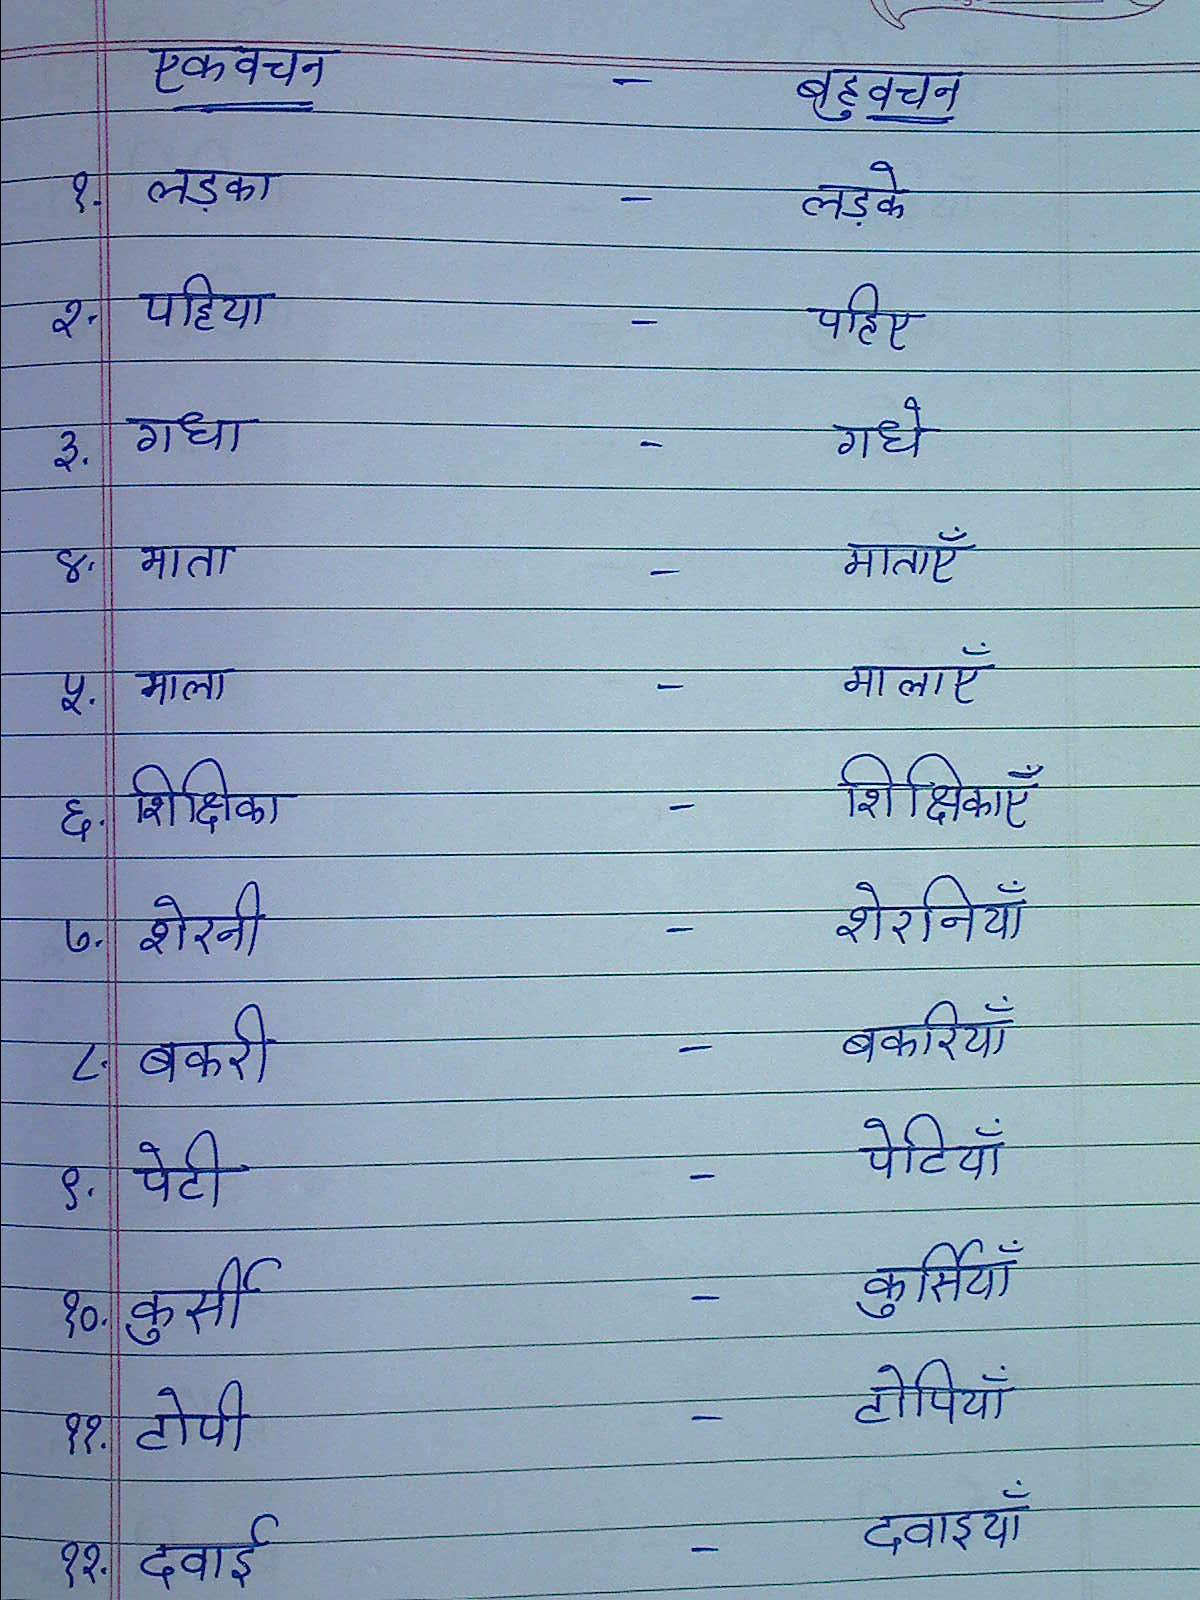 hight resolution of Cbse Board Hindi Book - Rajasthan Board f